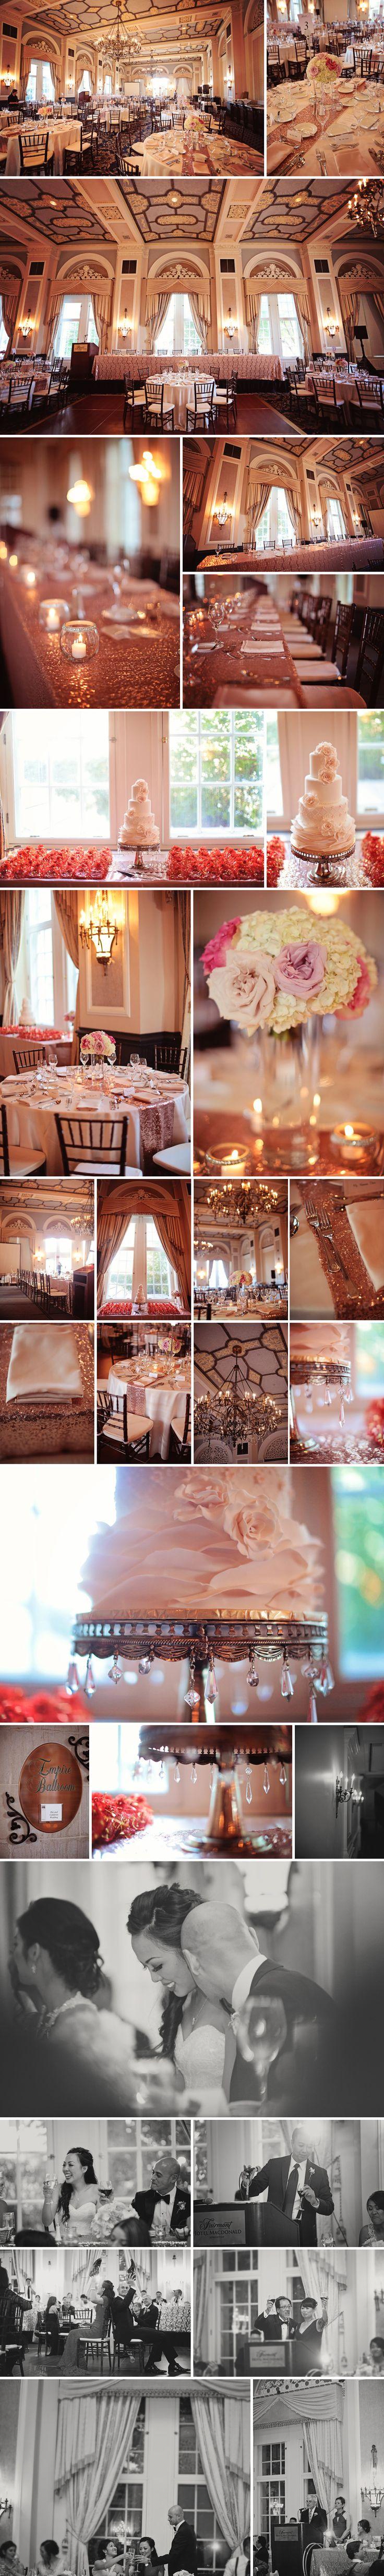 Edmonton fairmont hotel wedding. Eternal Reflections Photography. Best.